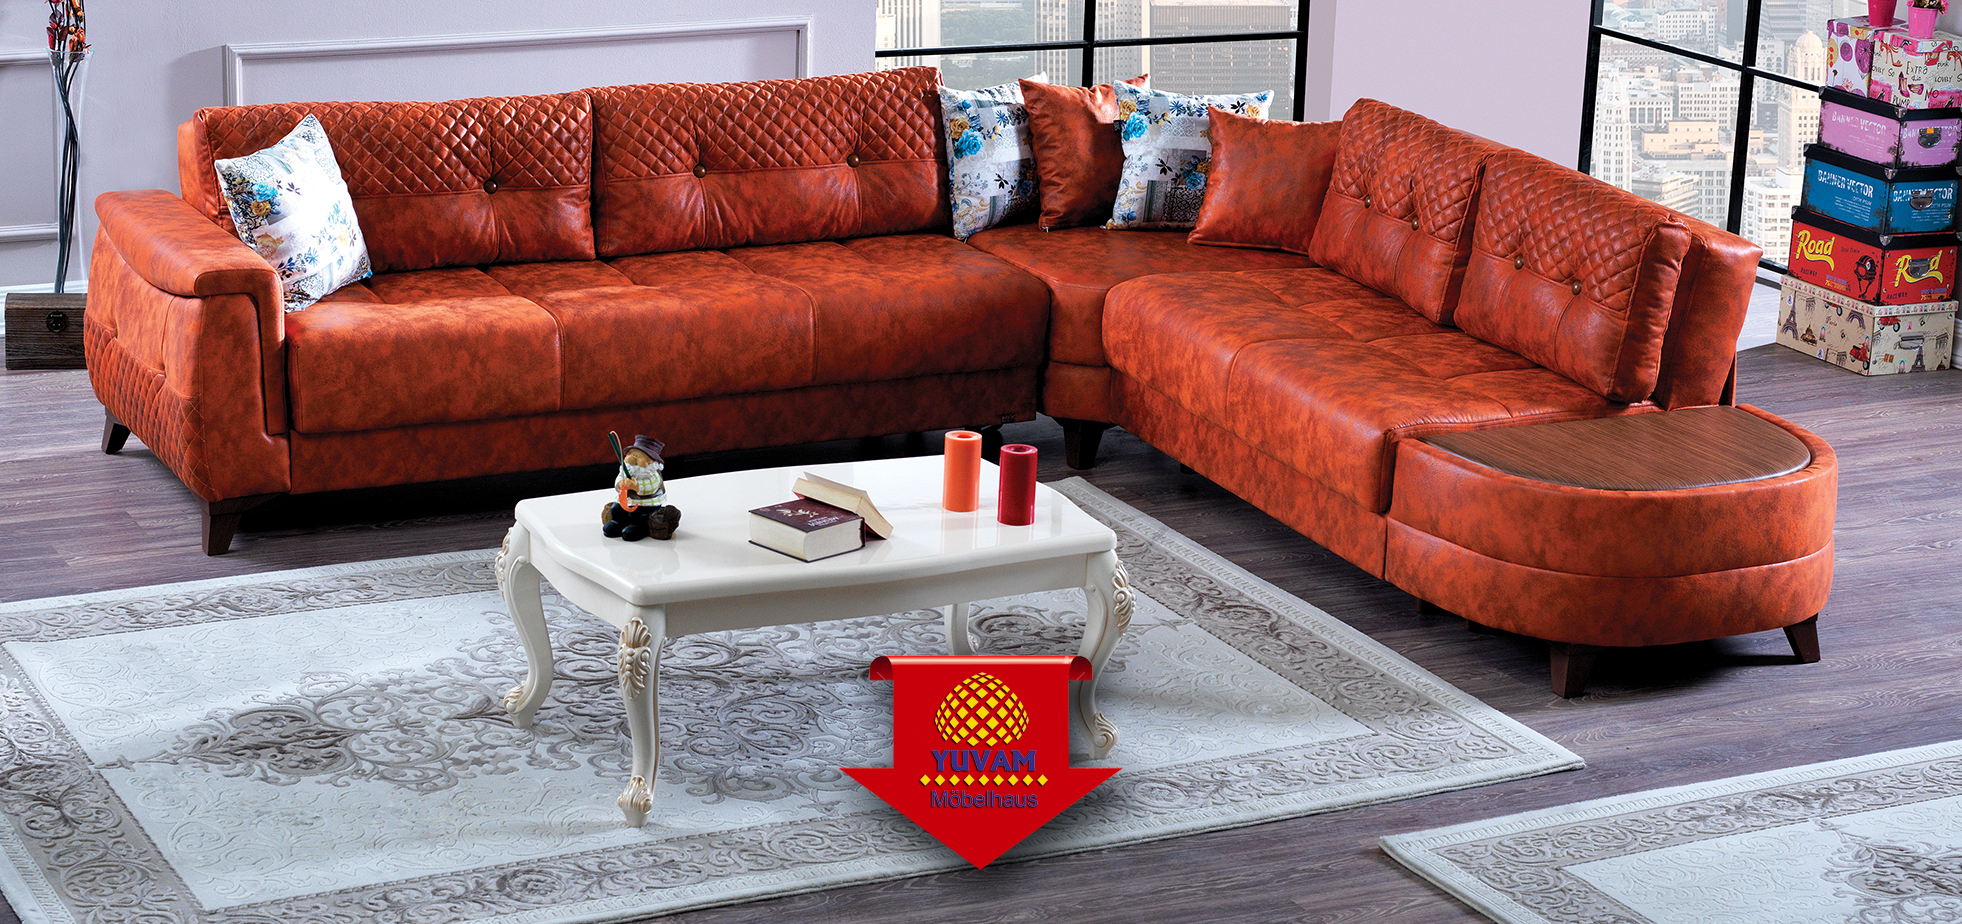 dora sitzecke 3 v 2 yuvam m belhaus in wuppertal cilek offizieller h ndler in europa. Black Bedroom Furniture Sets. Home Design Ideas